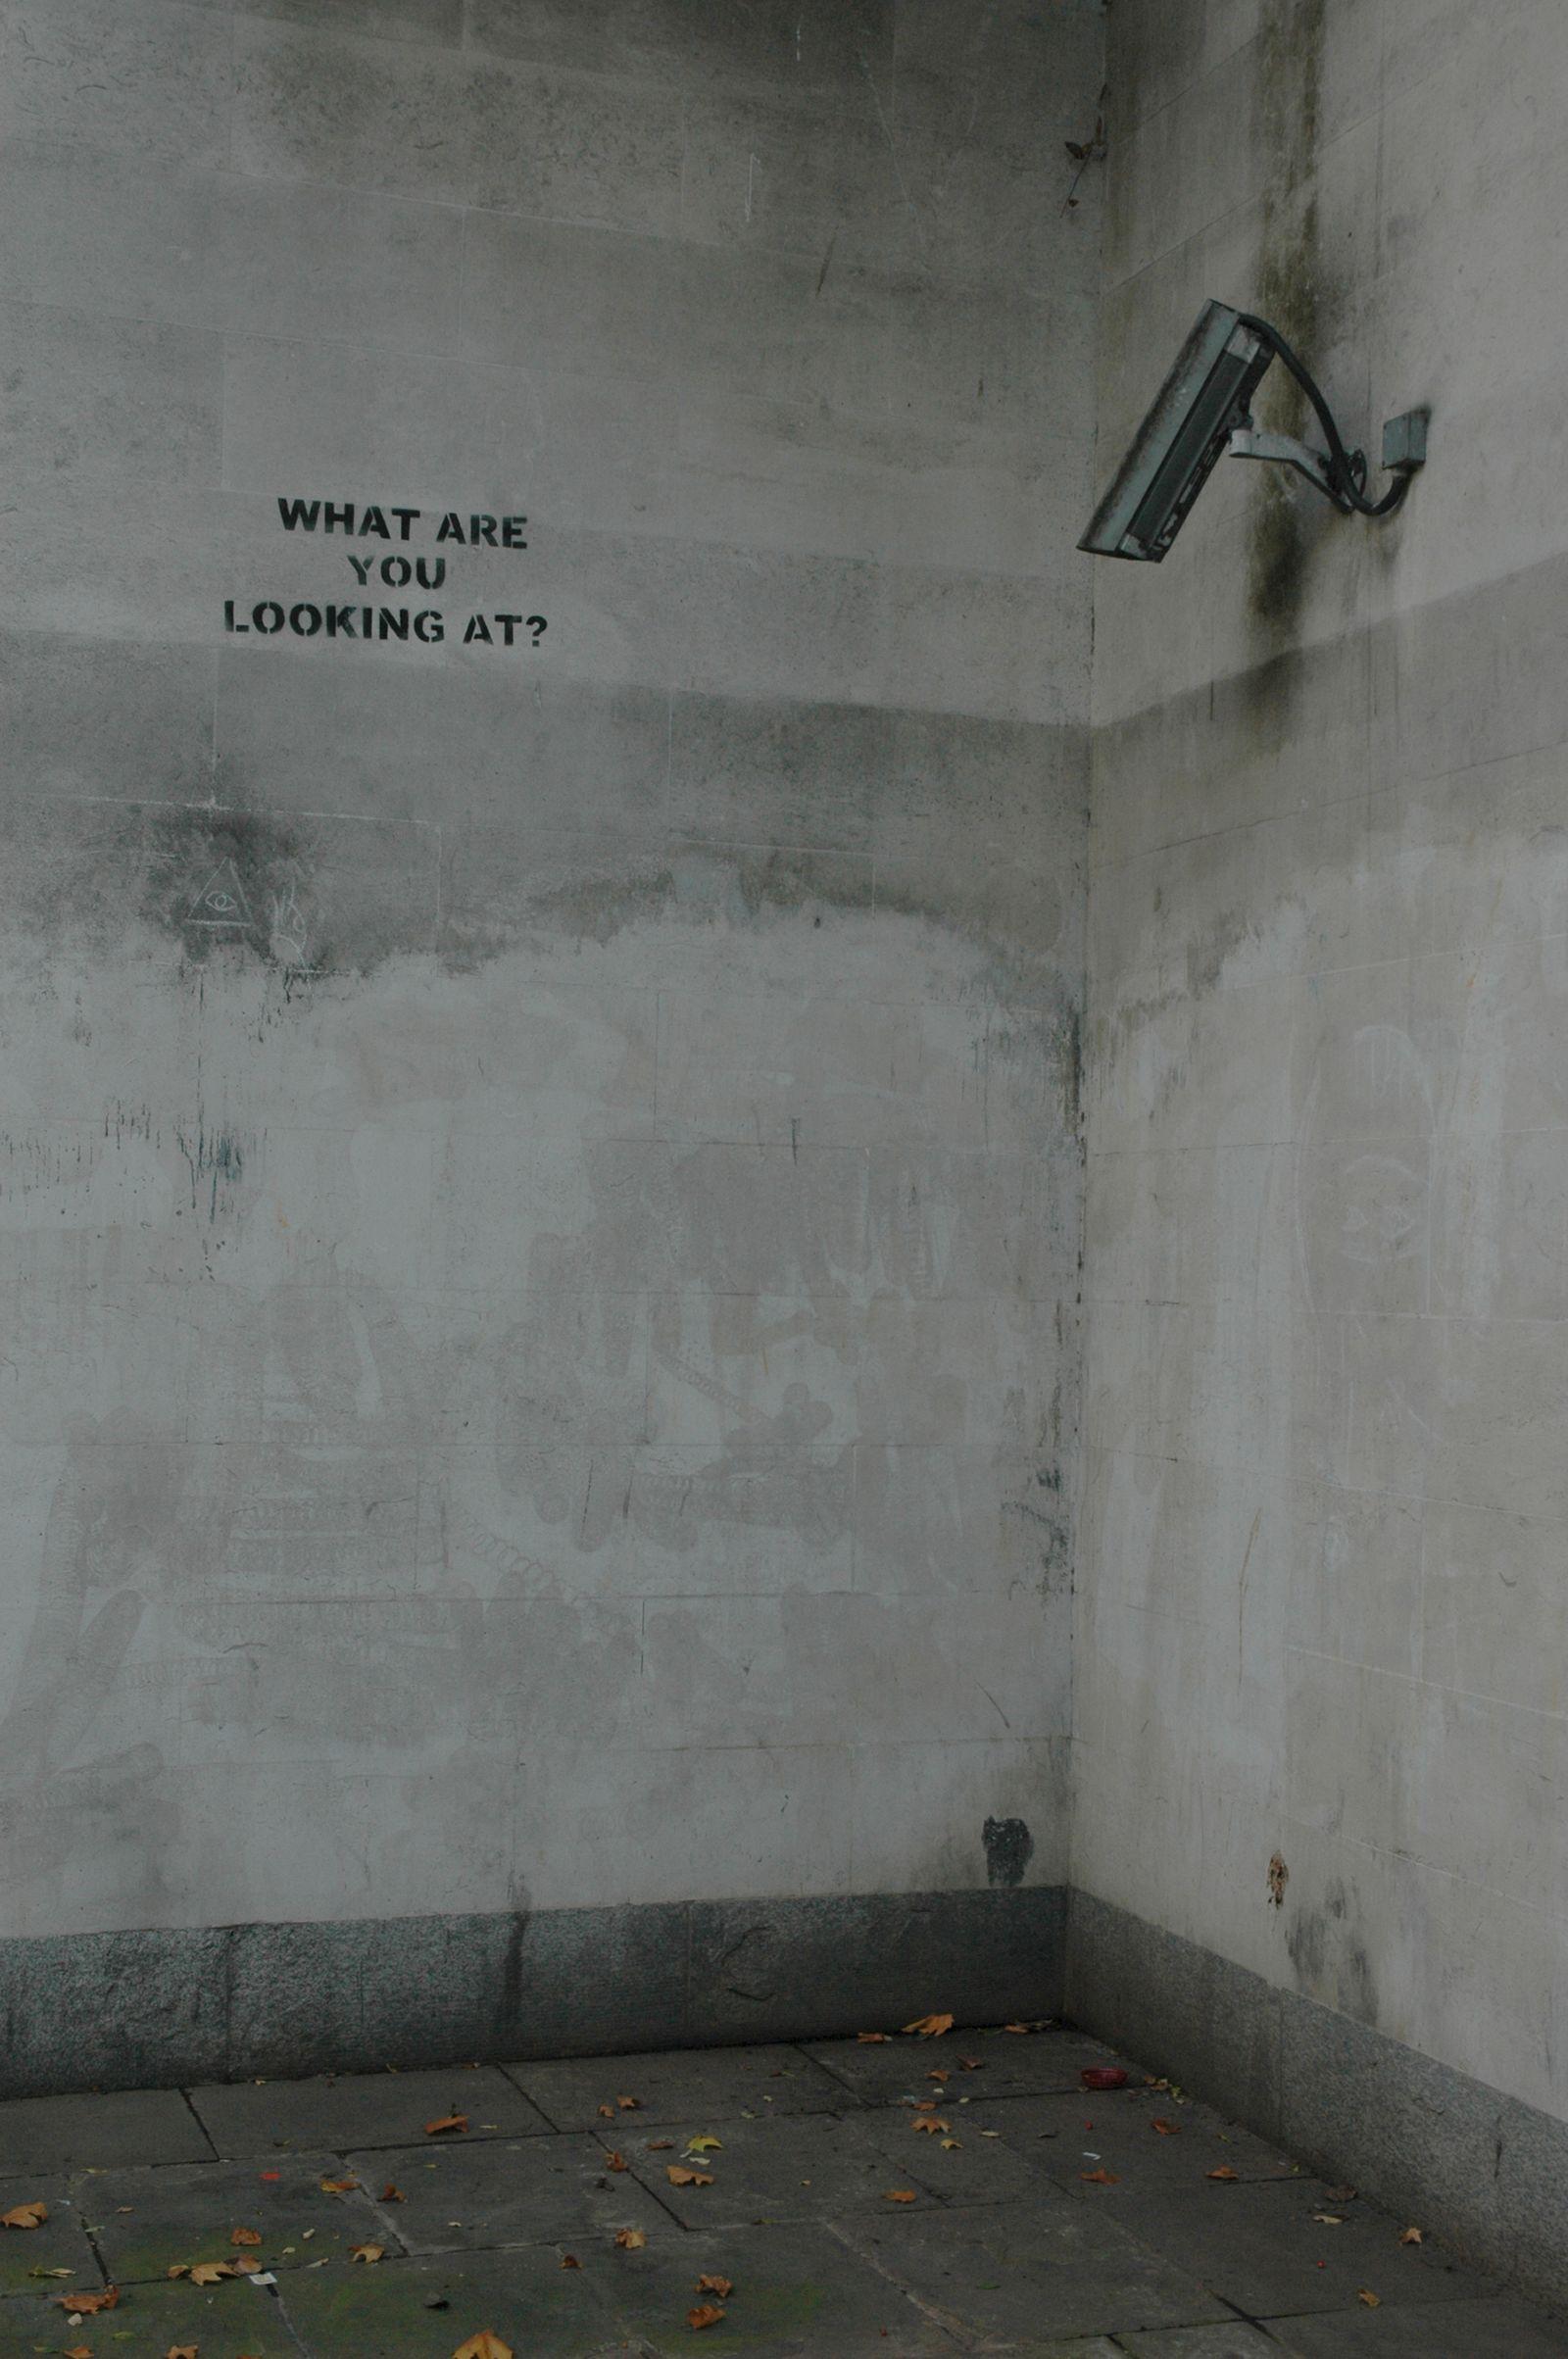 Banksy graffiti & CCTV camera, Marble Arch, London UK